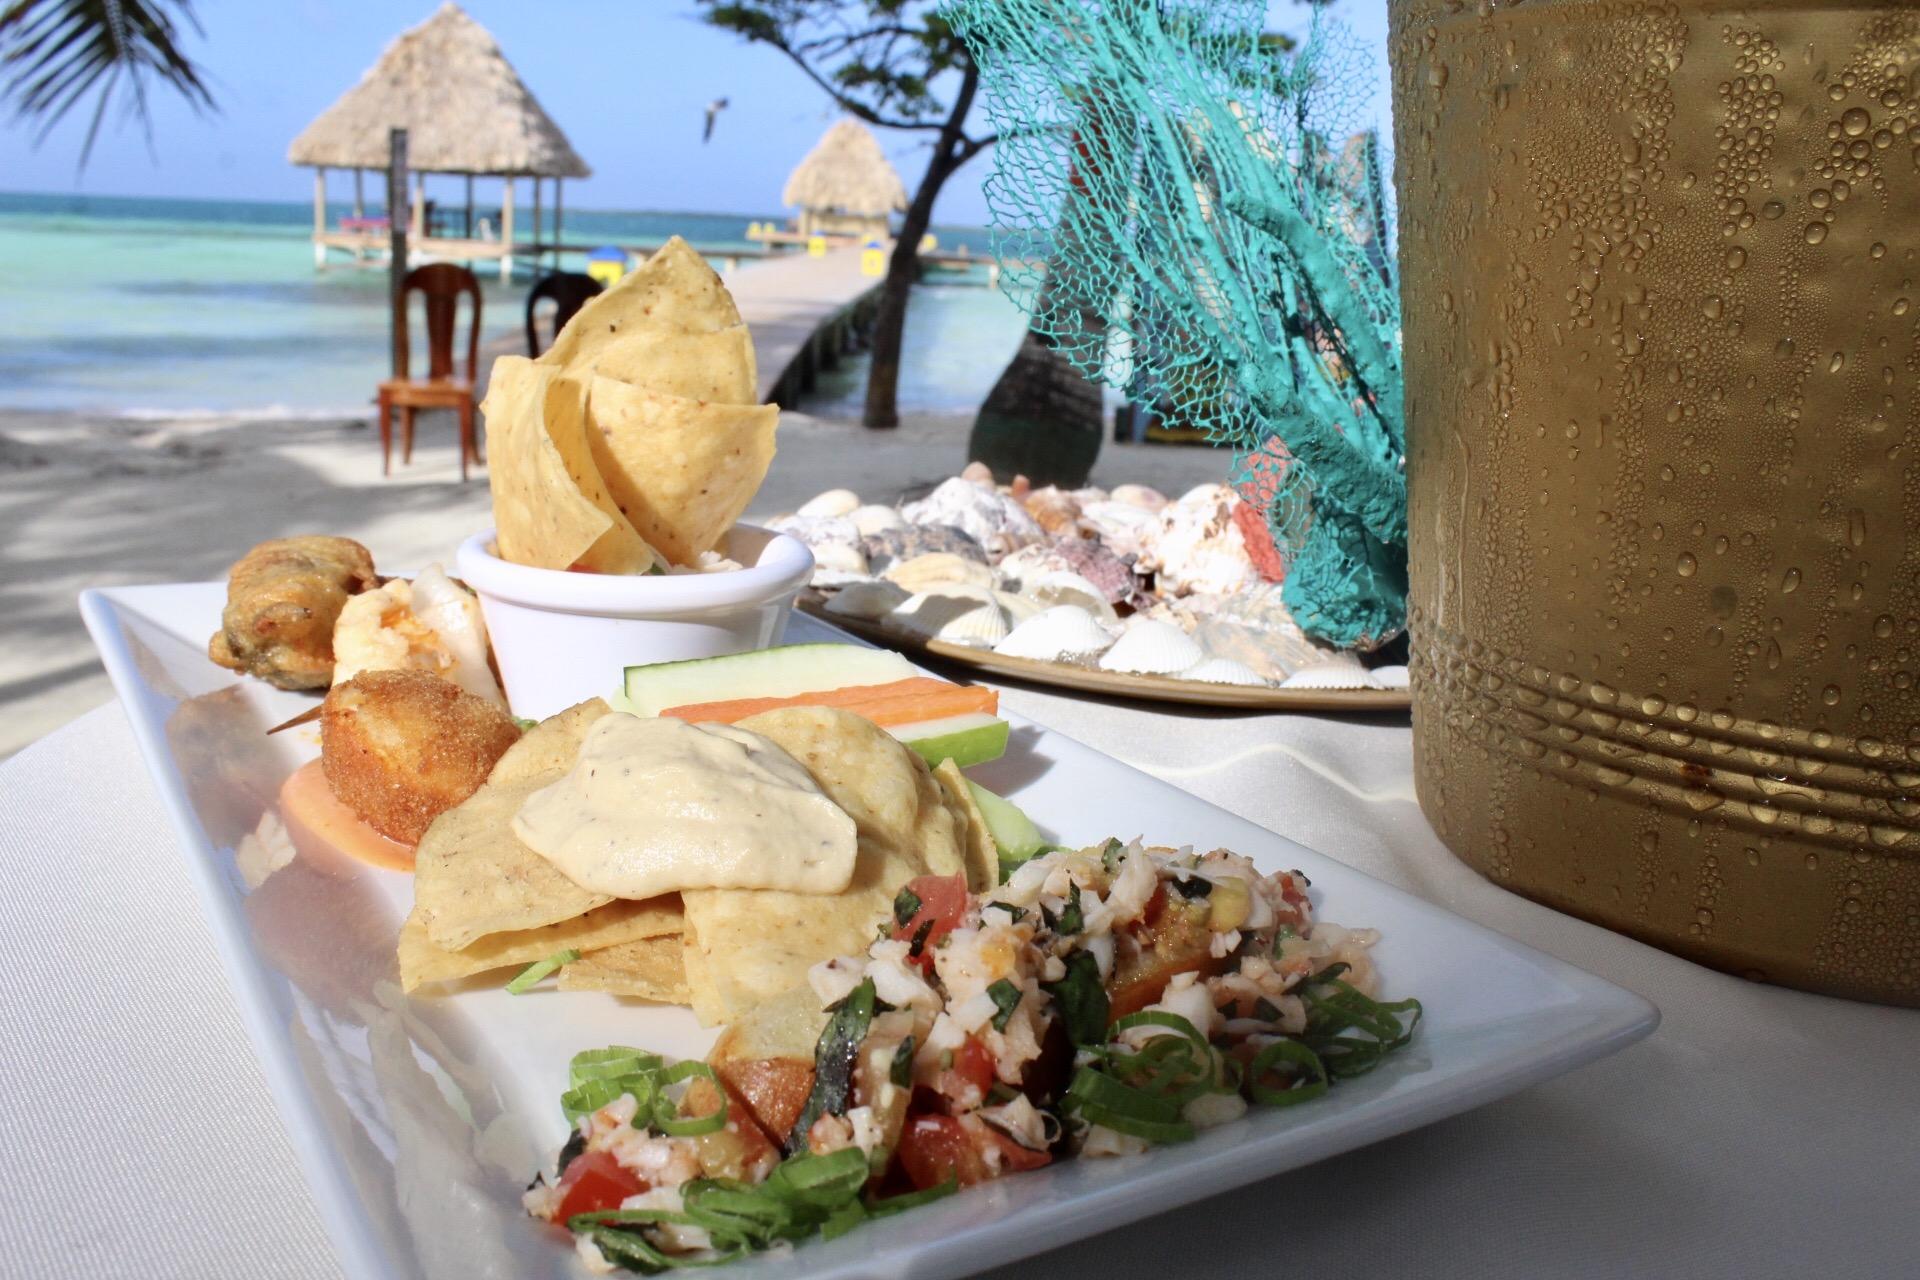 Lobster delicacies at Coco Plum Island Resort